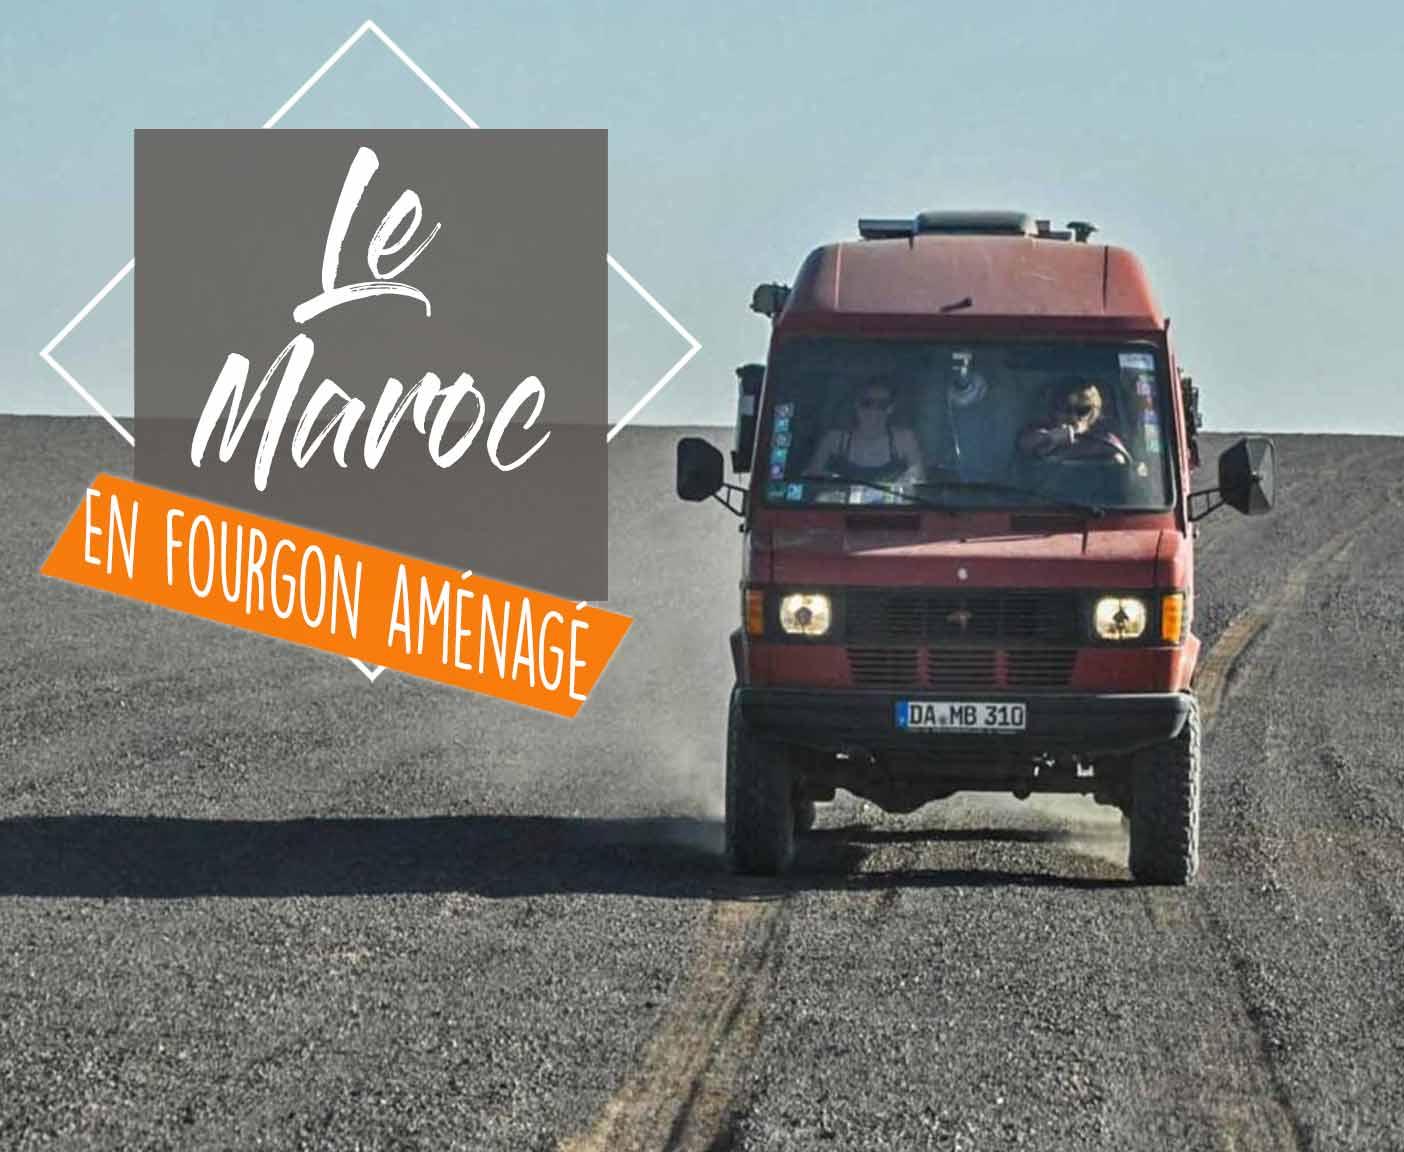 maroc-maghreb-sahara-fourgon-van-camping-car-4x4-roadtrip-voyage-vanlife-vacance-location-desert